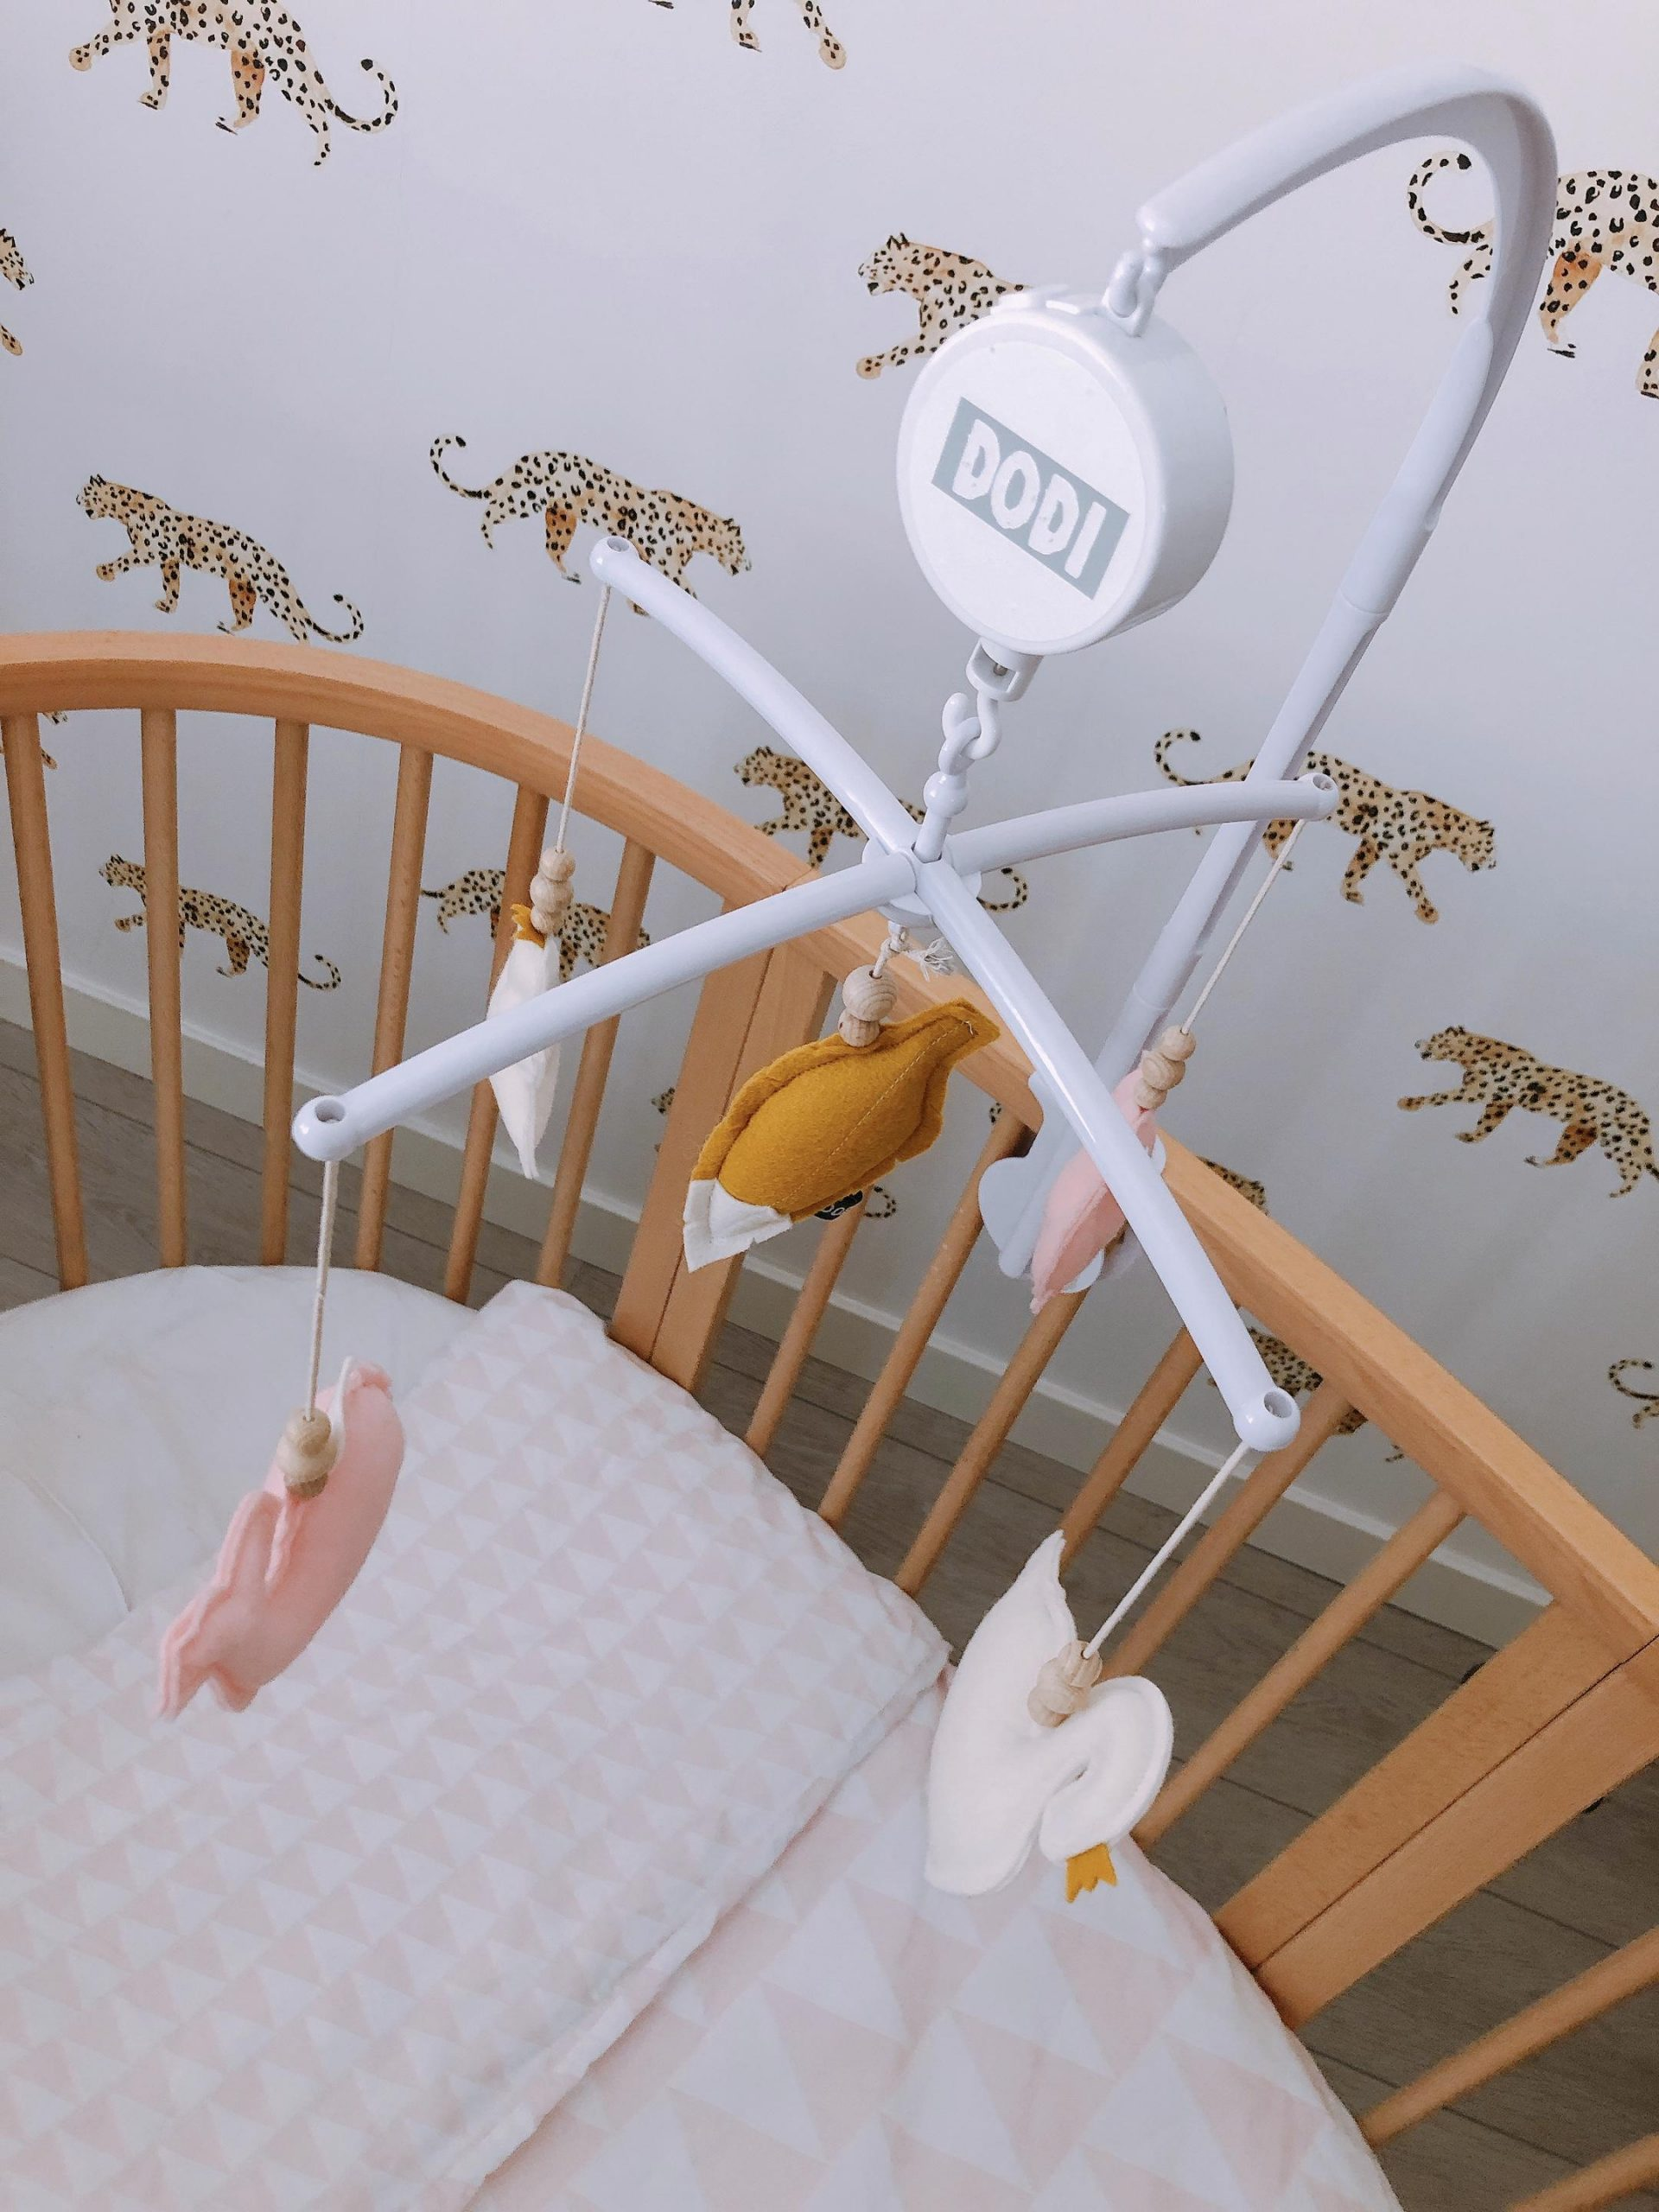 IMG 6966 2160x2880 1 scaled - De baby/kinderkamer van Hazel - roze, hout & marmer!